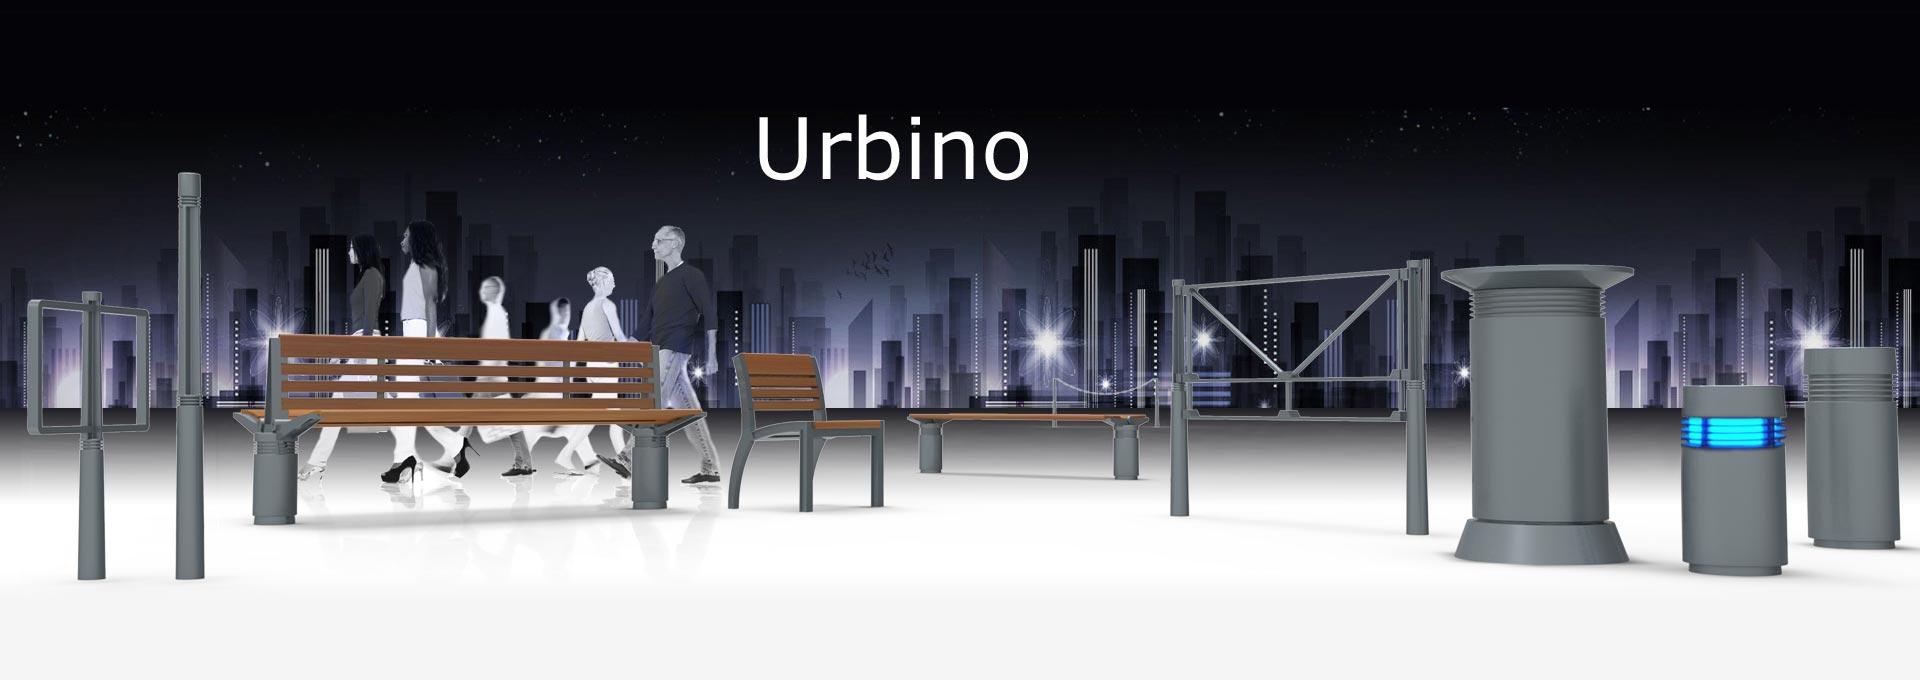 ligne-urbino-master-final